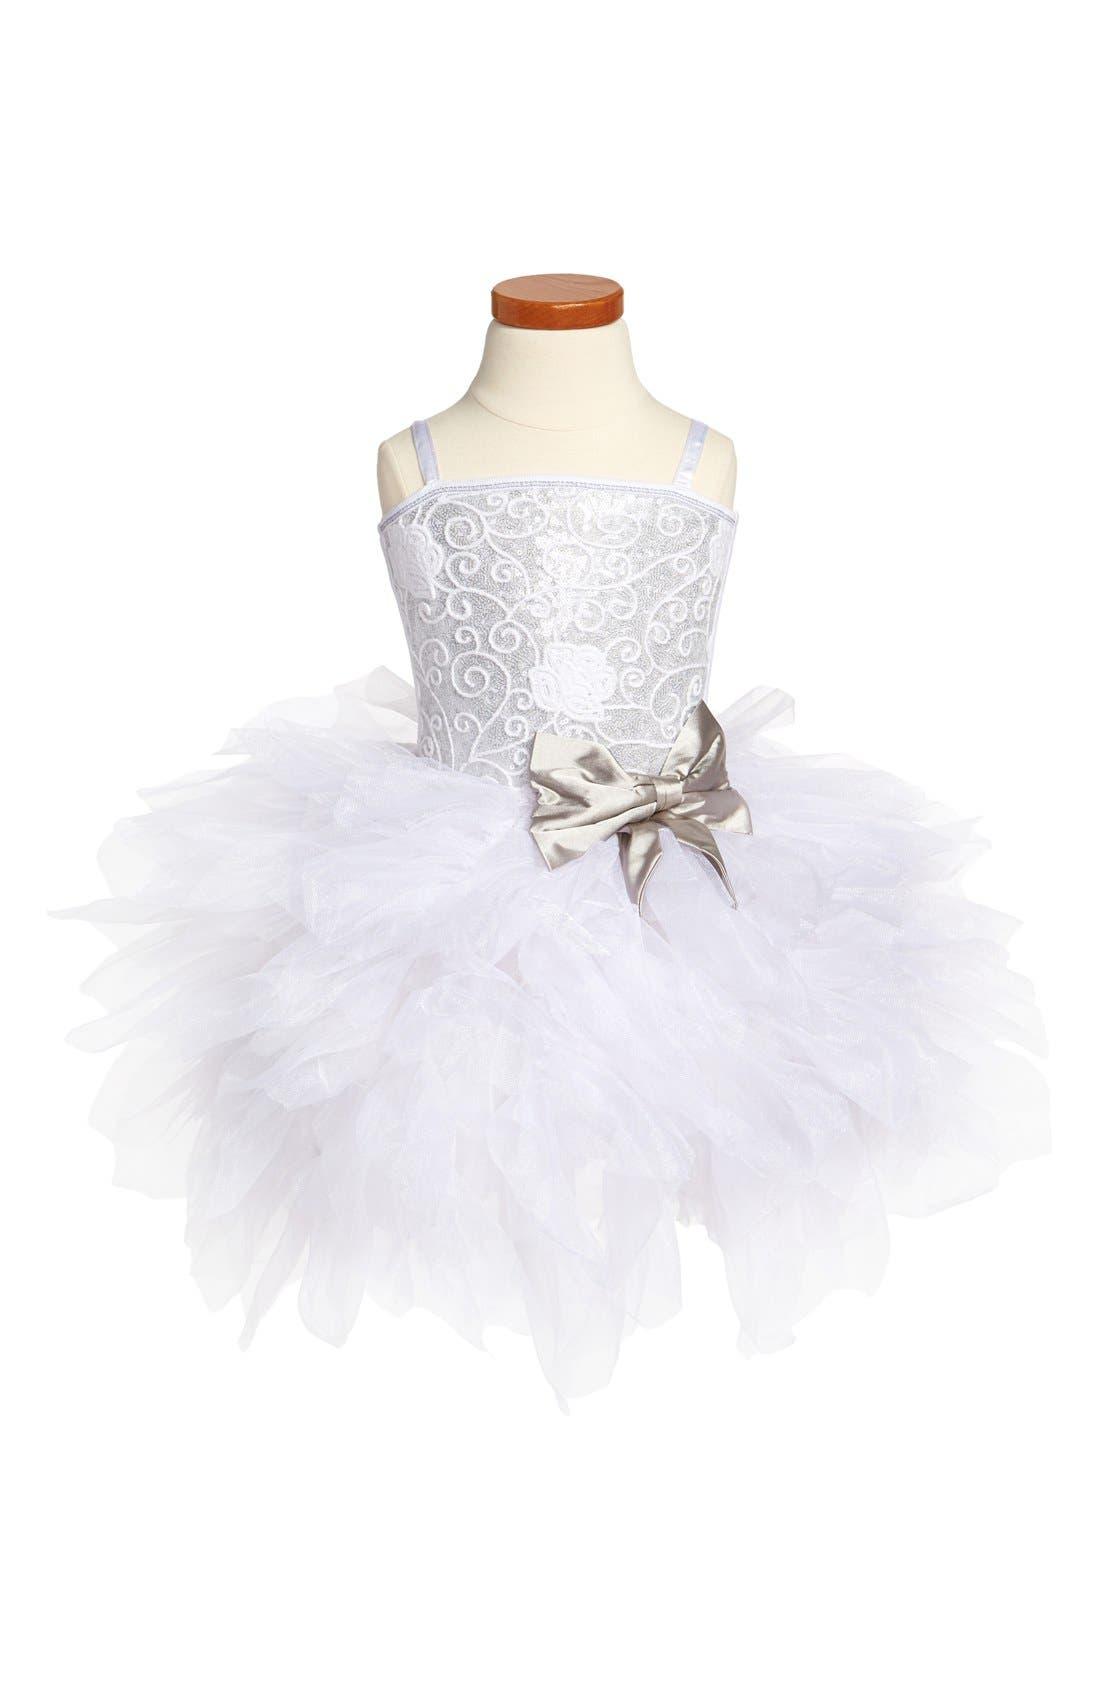 Alternate Image 1 Selected - Ooh! La, La! Couture 'Emma' Dress (Little Girls & Big Girls)